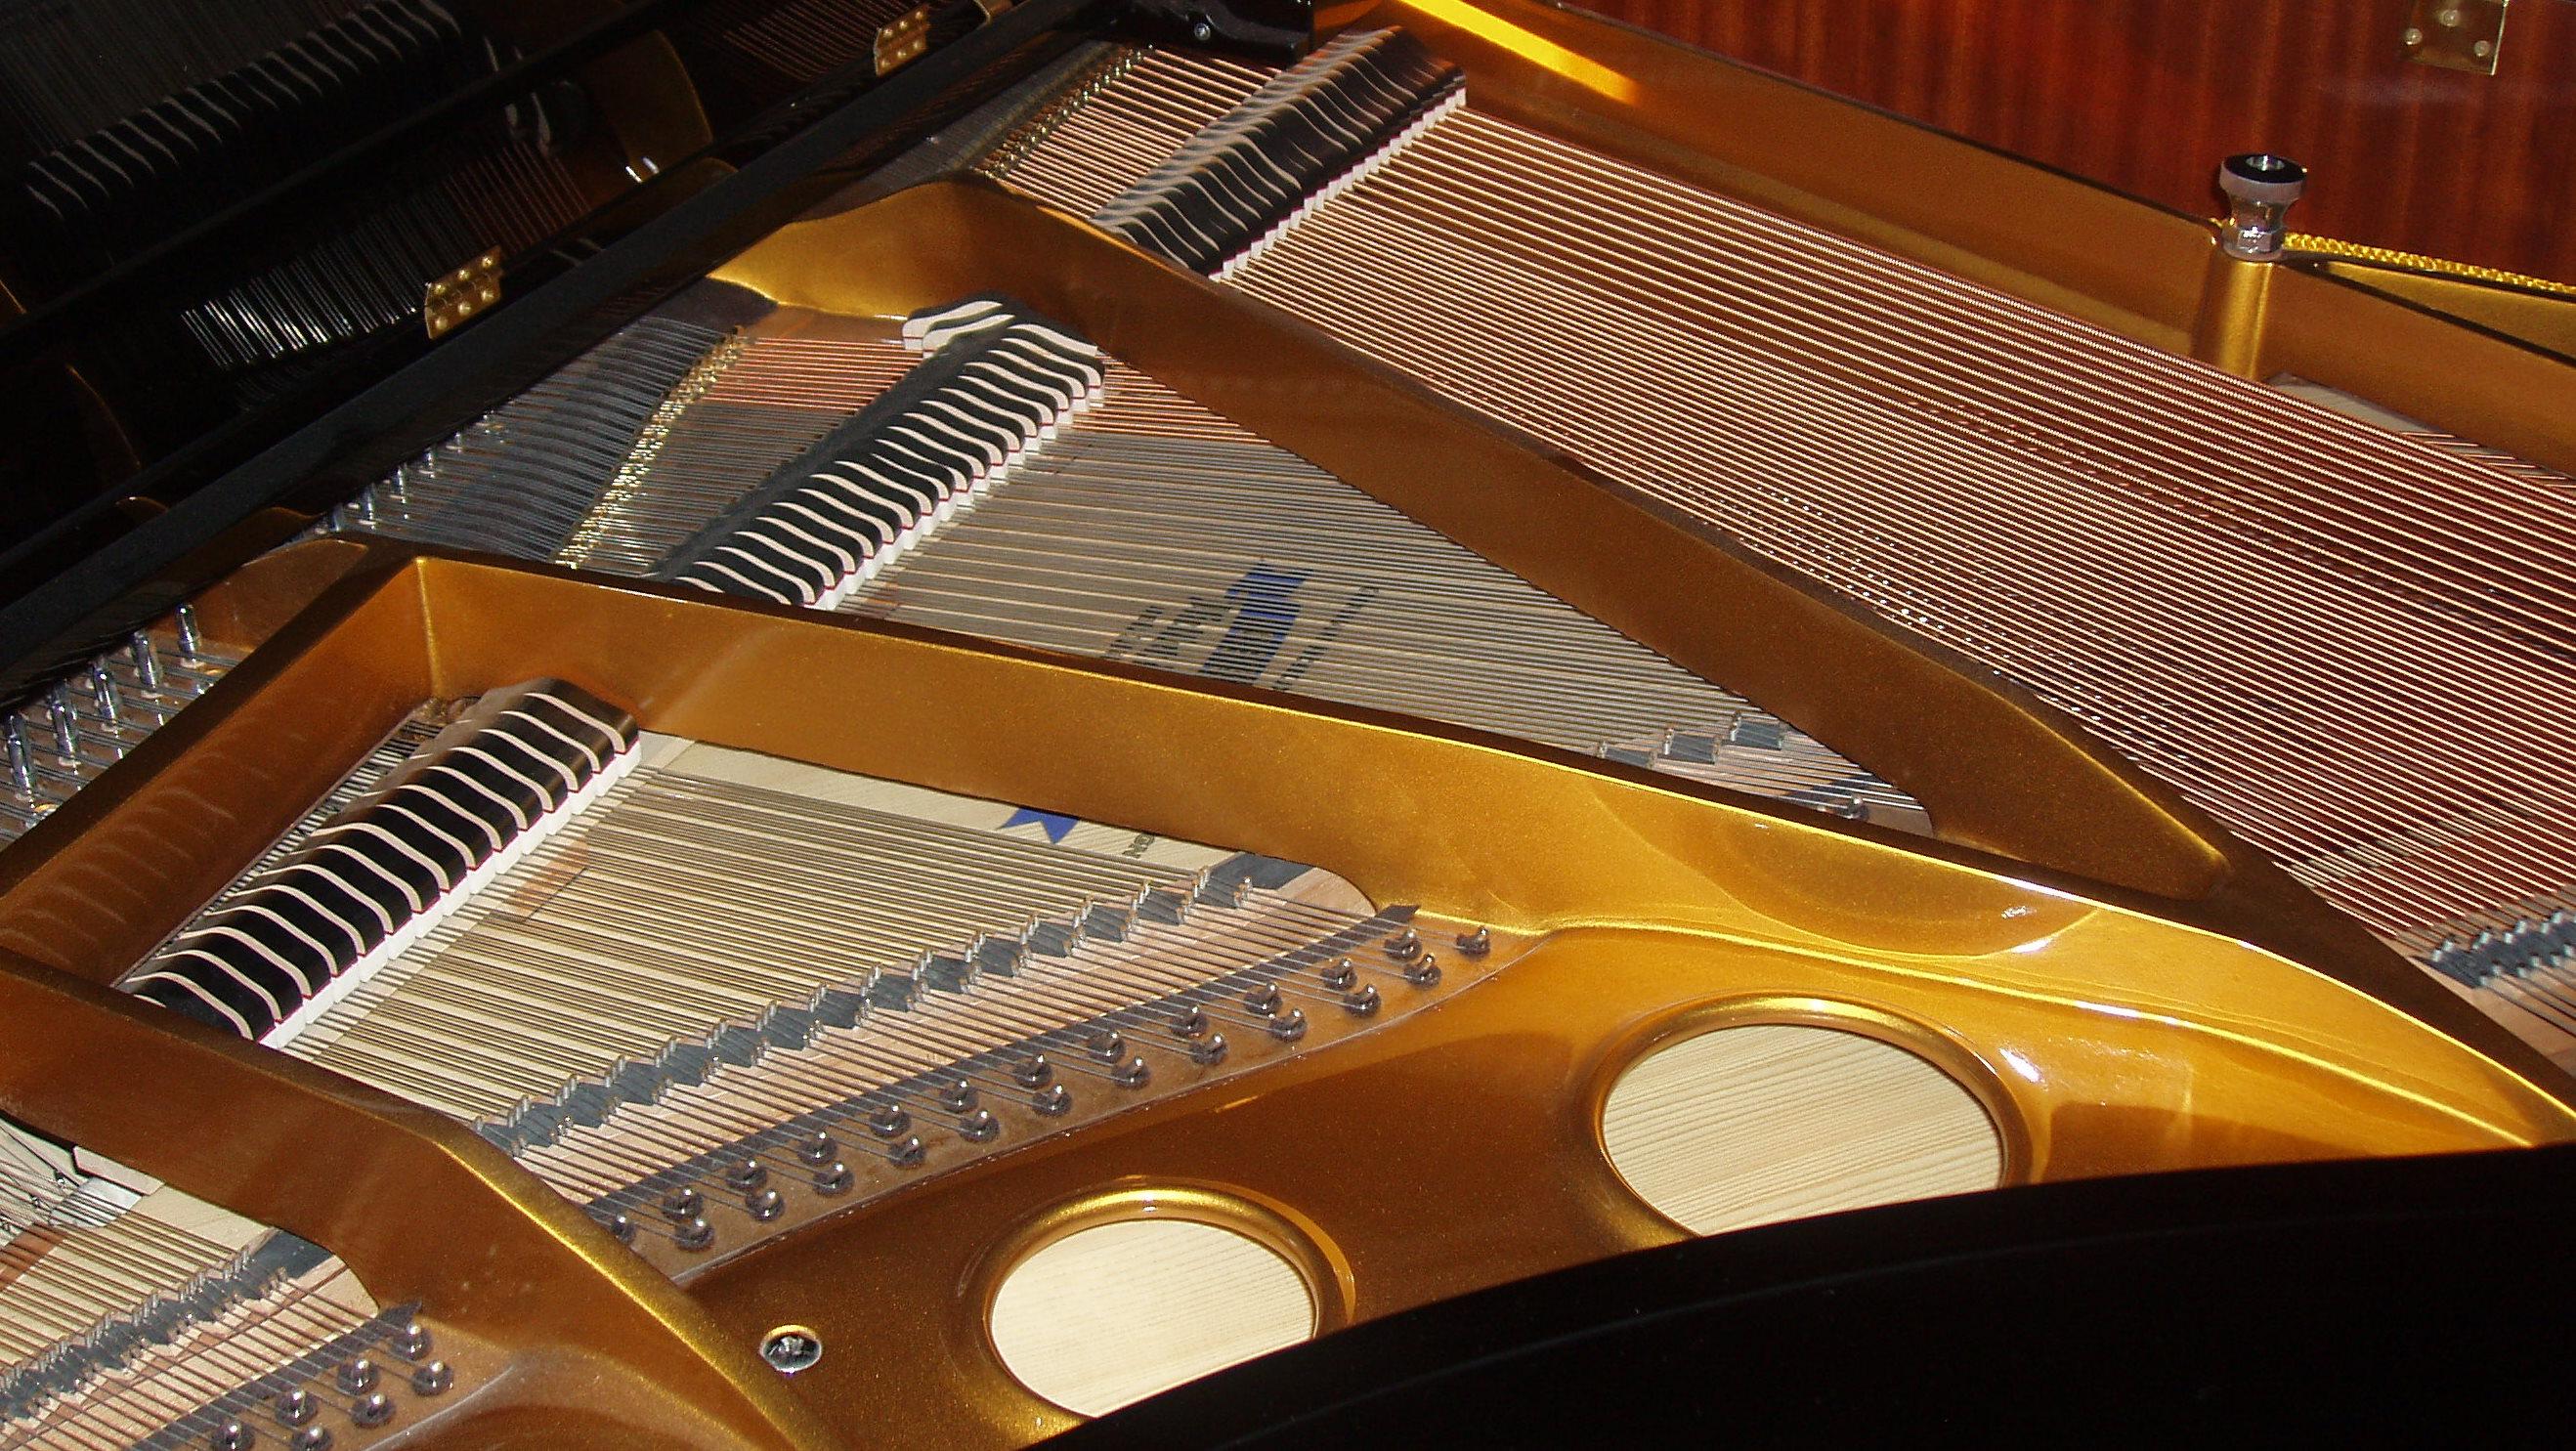 File:Inside of a Grand Piano.jpg - Wikimedia Commons